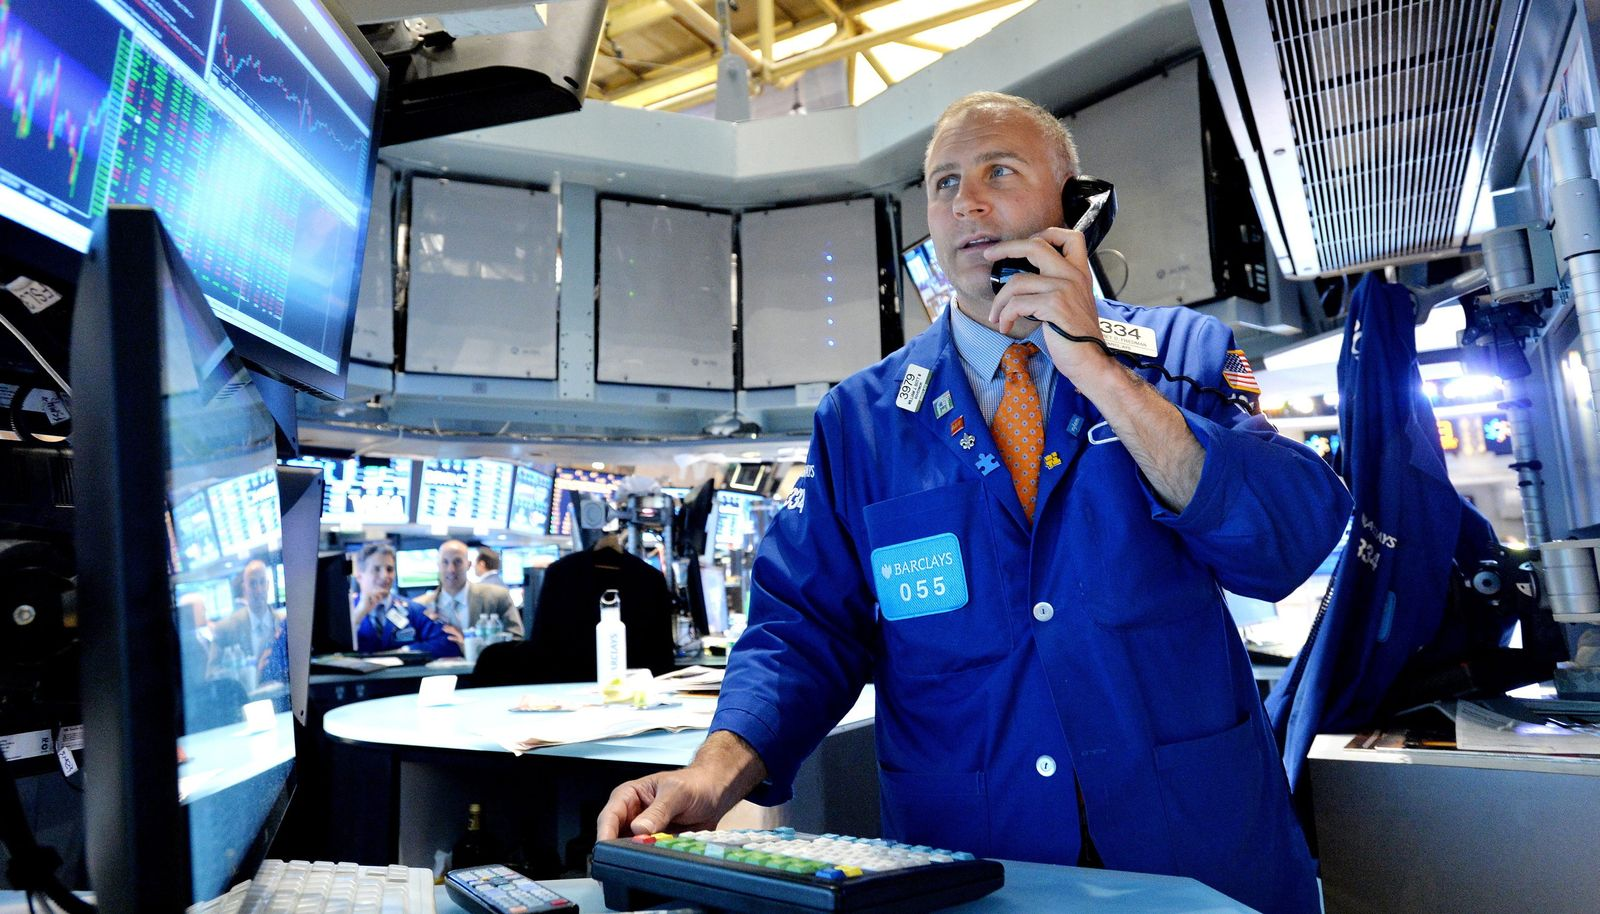 NYSE / Börse / Wall Street